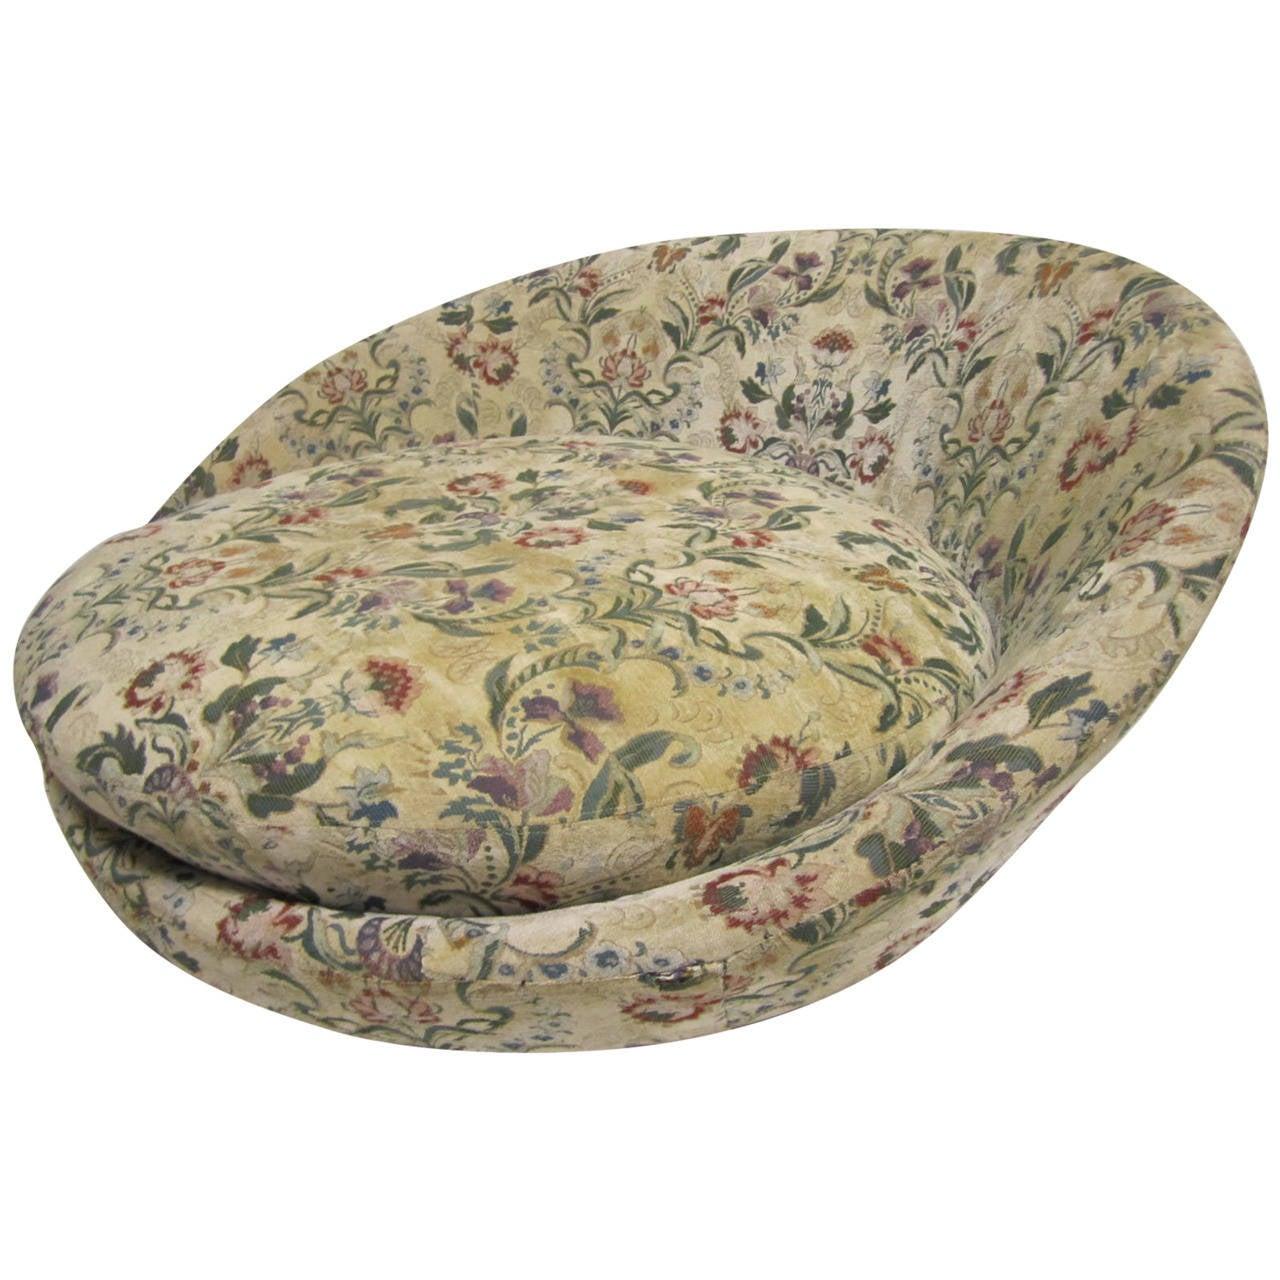 Wonderful Circular Milo Baughman Lounge Chair Mid Century Modern at 1stdibs